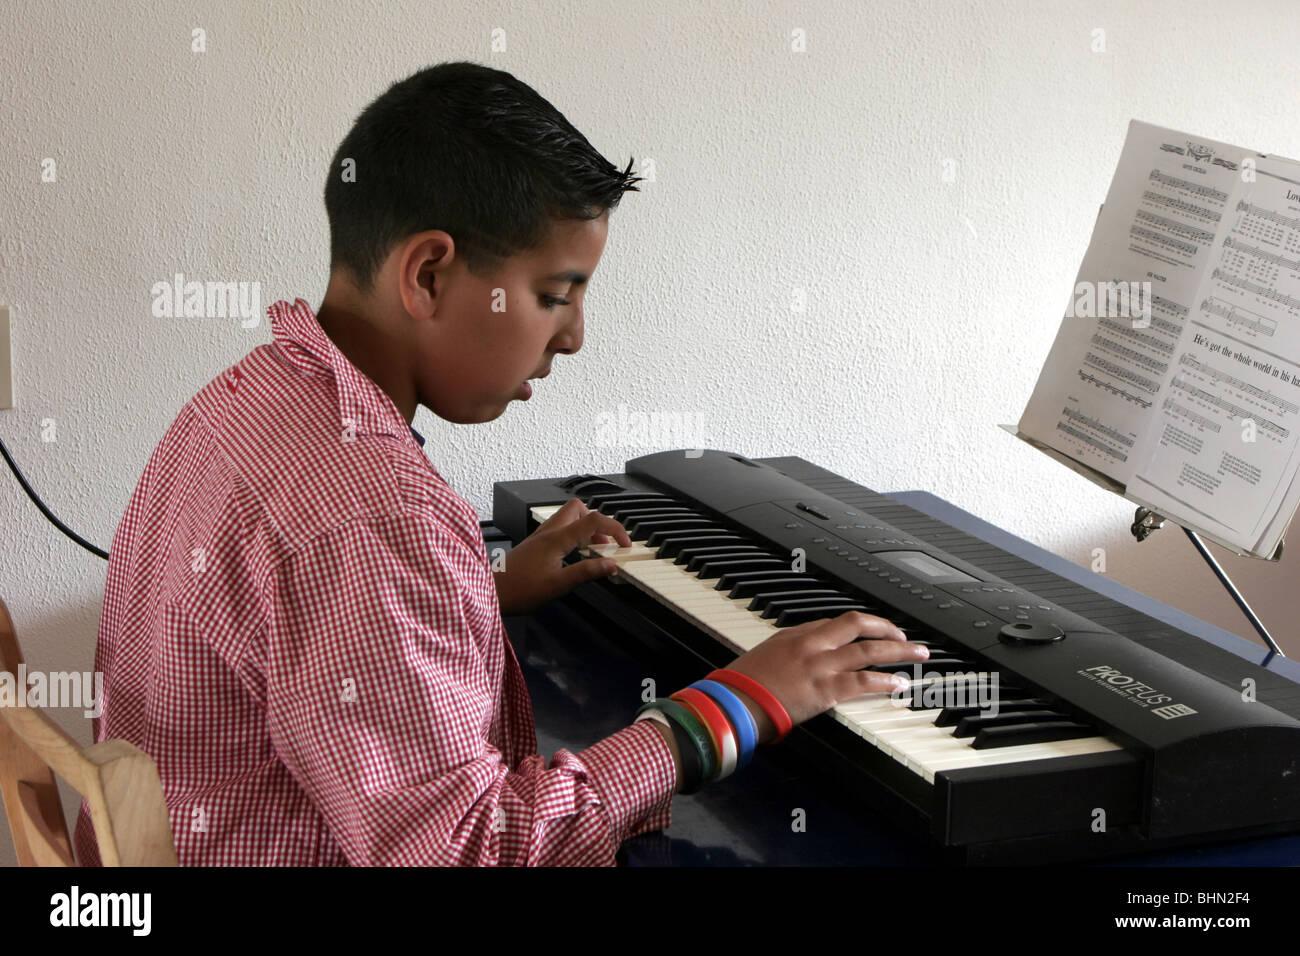 Teenage boy making music  at synthesizer keyboard - Stock Image